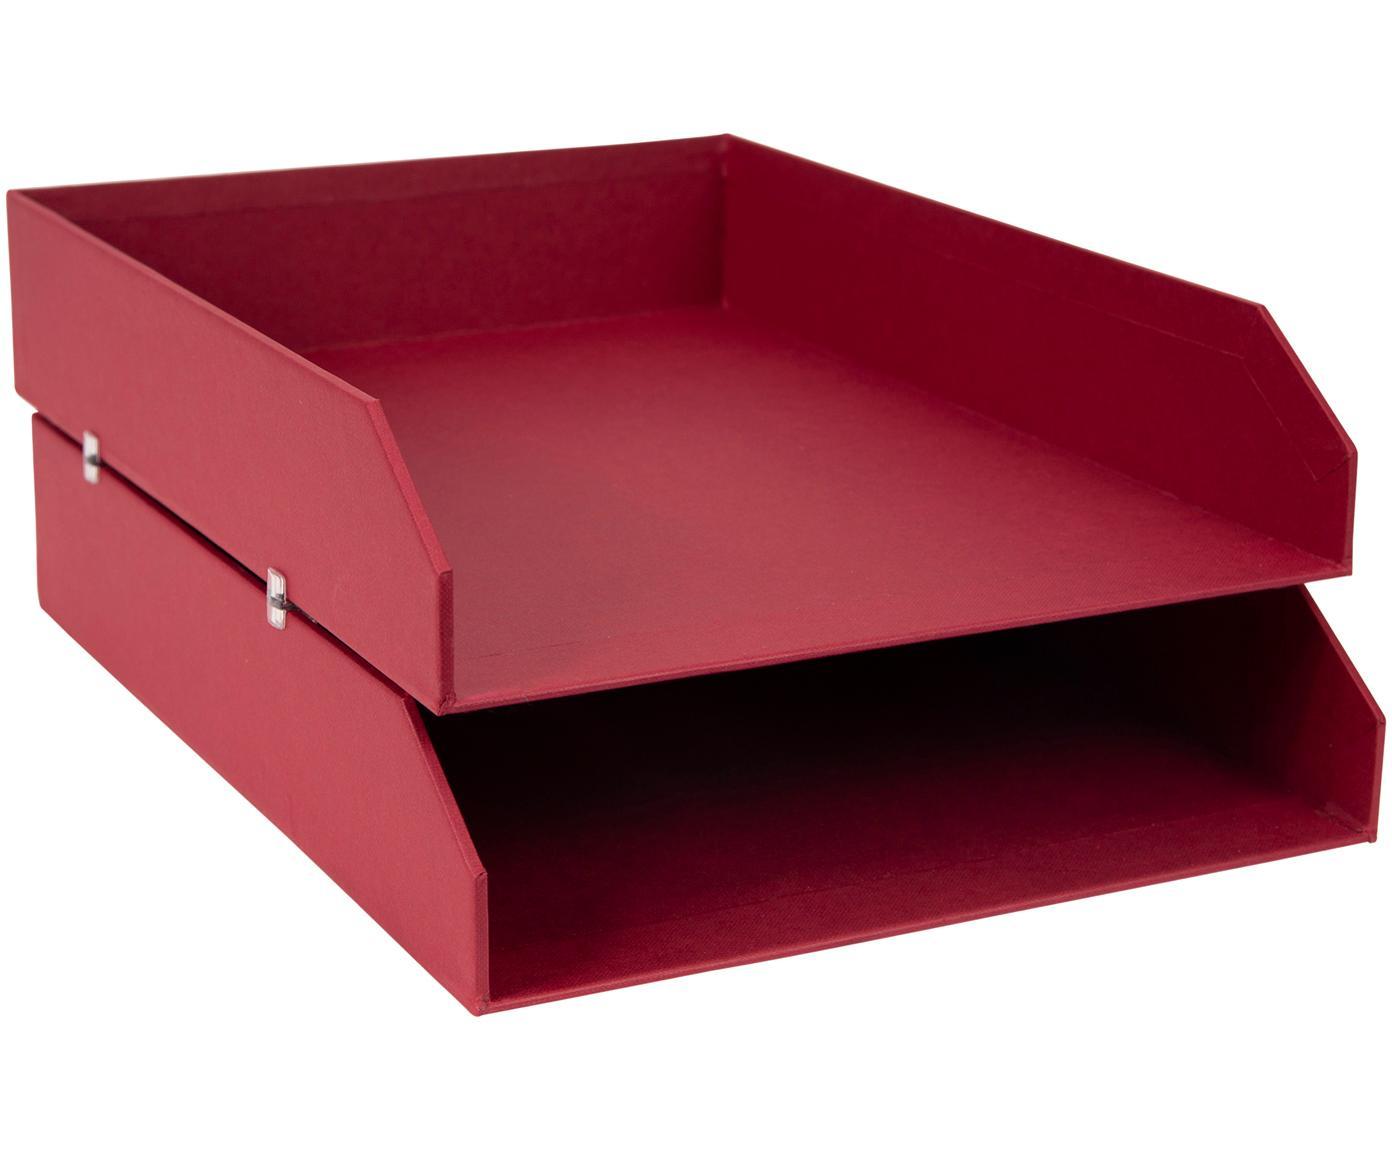 Dokumenten-Ablagen Hakan, 2 Stück, Fester, laminierter Karton, Dunkelrot, B 23 x T 31 cm